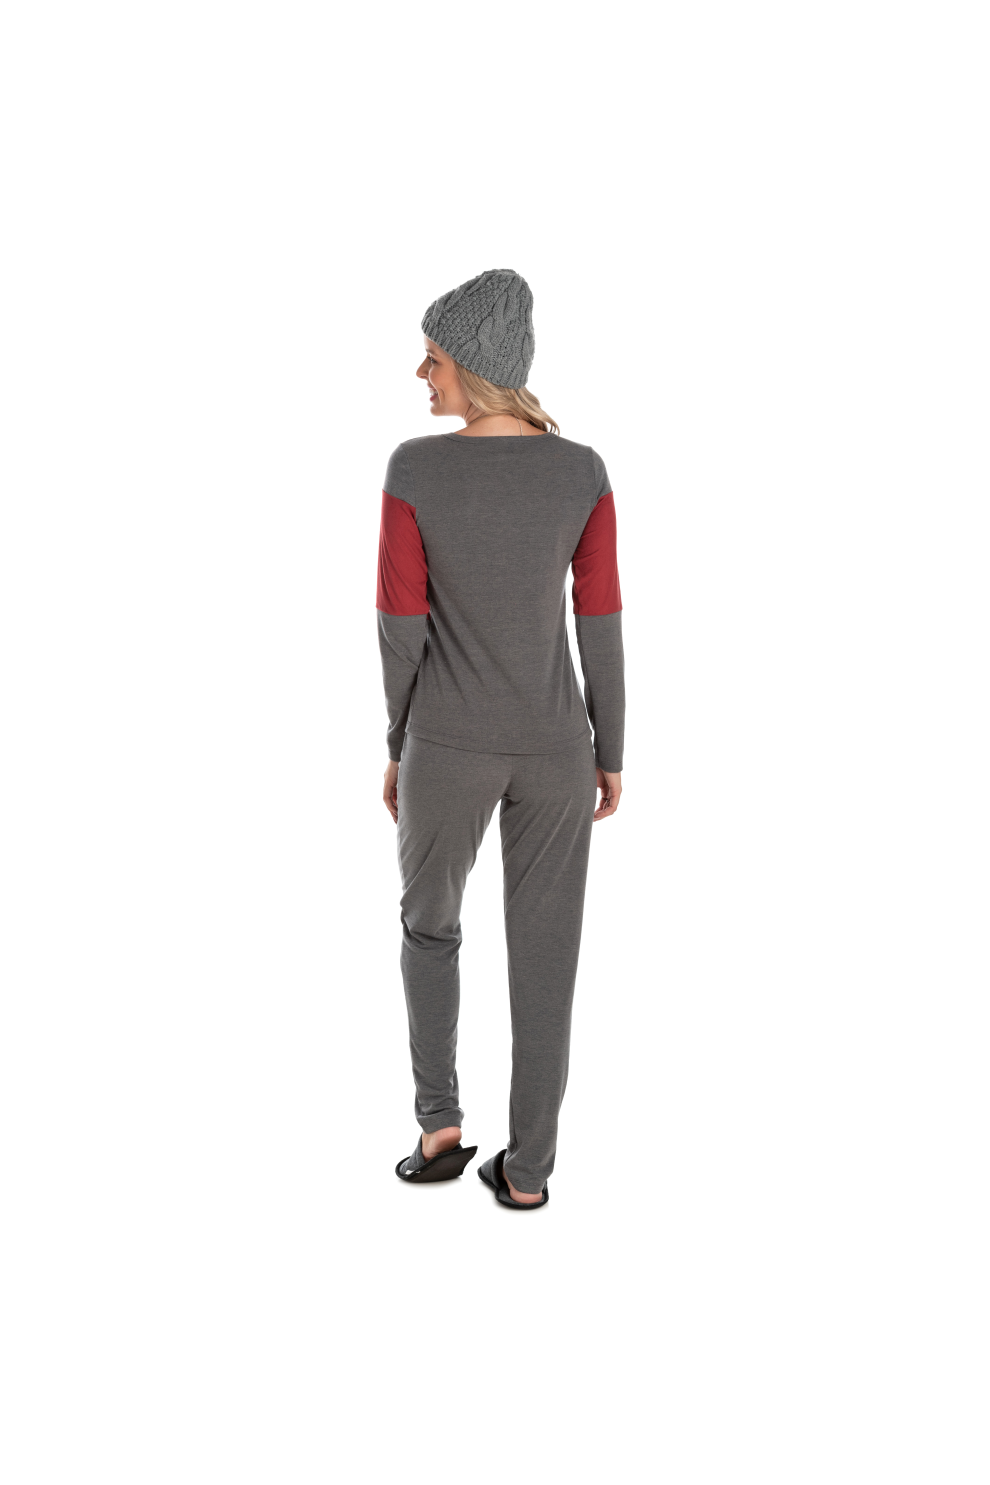 202/E - Pijama Longo Adulto Feminino Suede Bordô